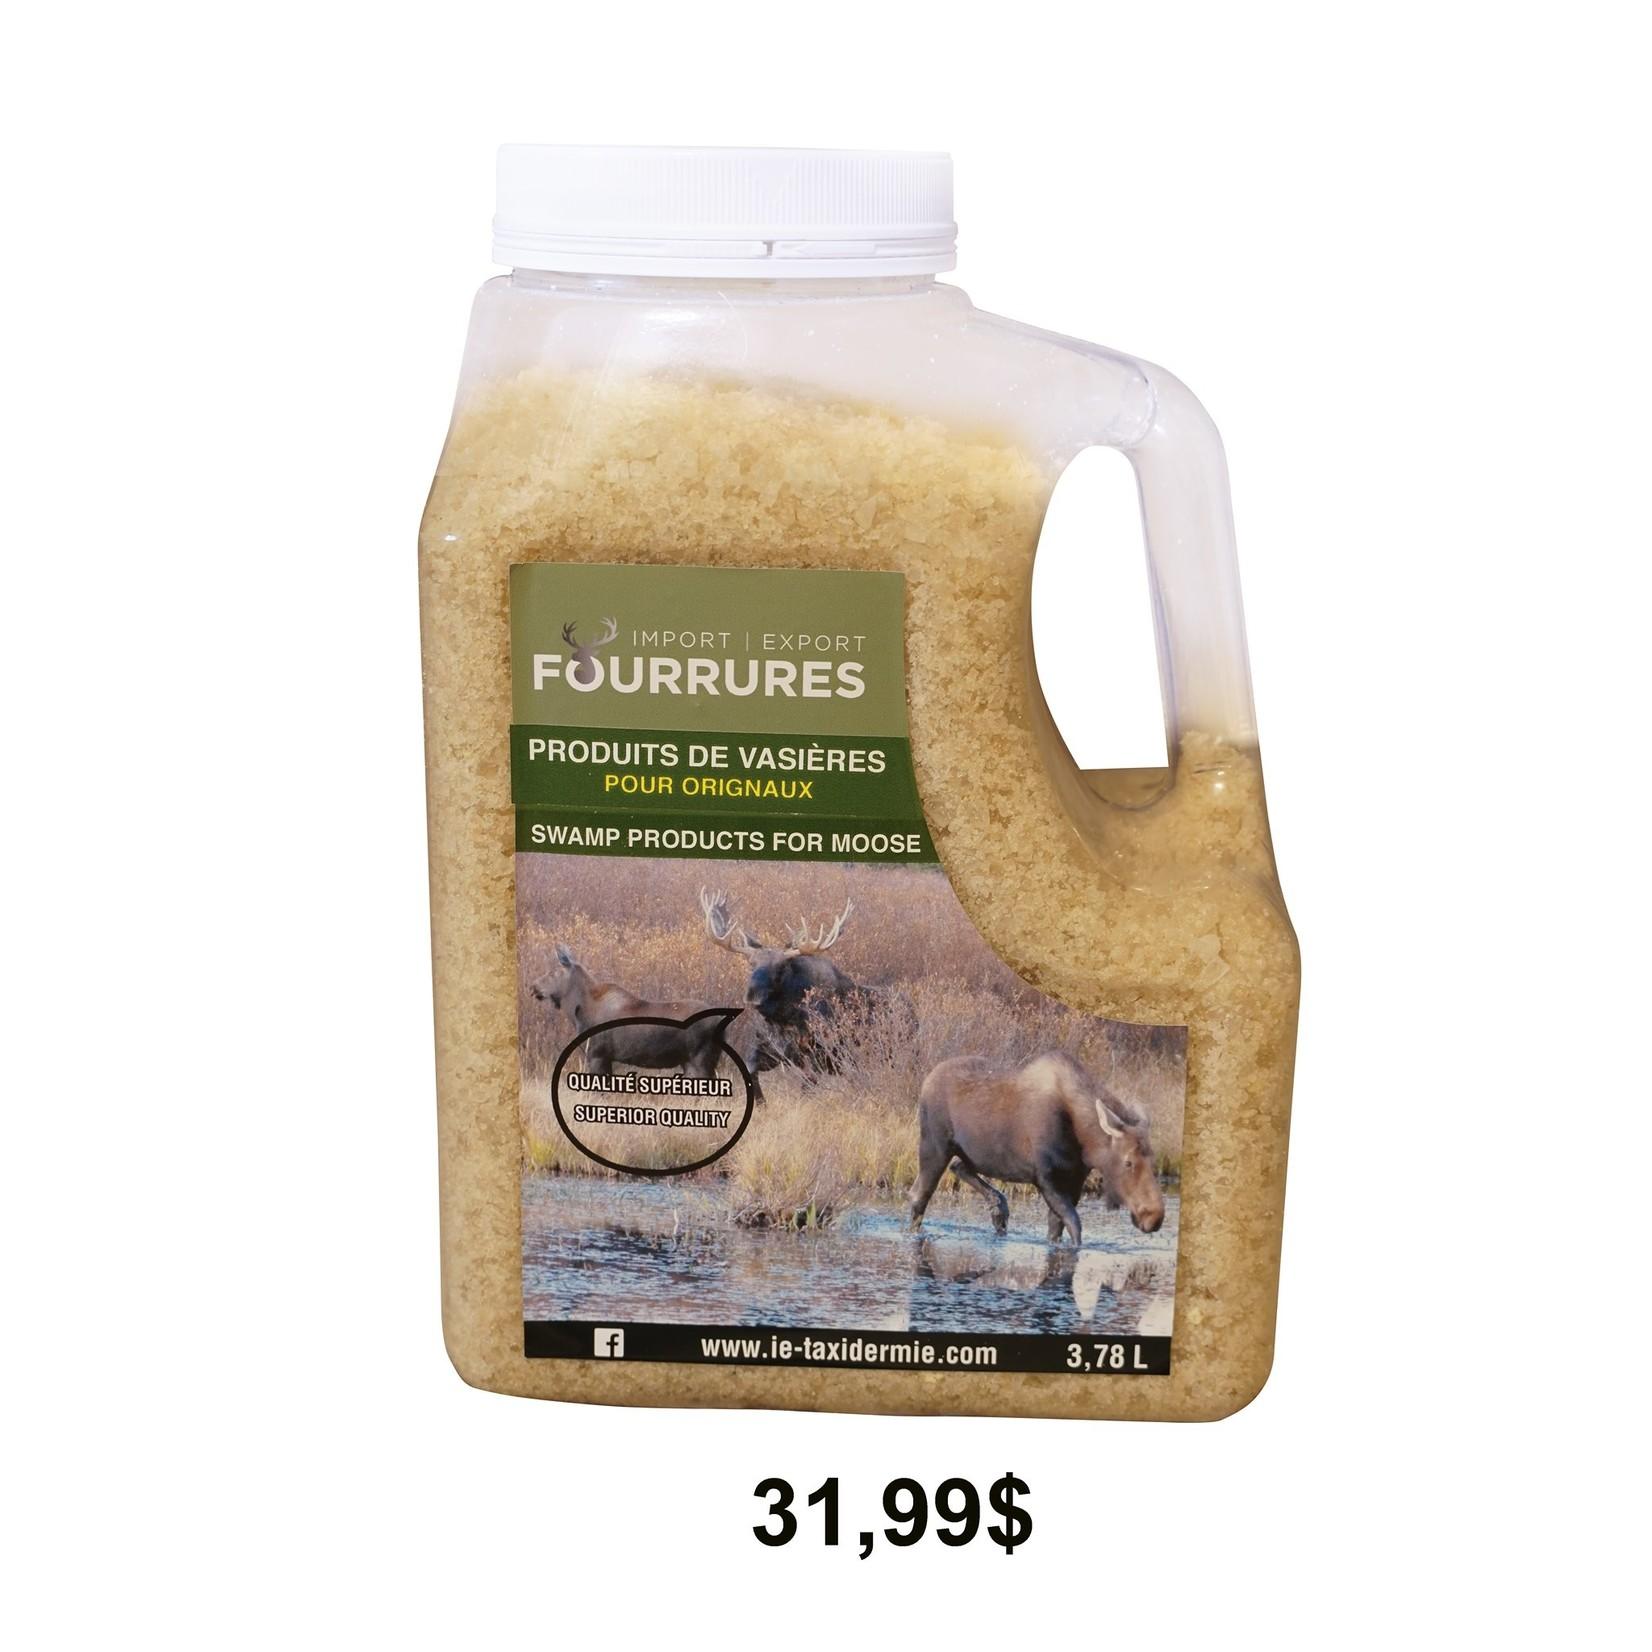 Import Export Fourrures Inc. Mudflats Orignal products